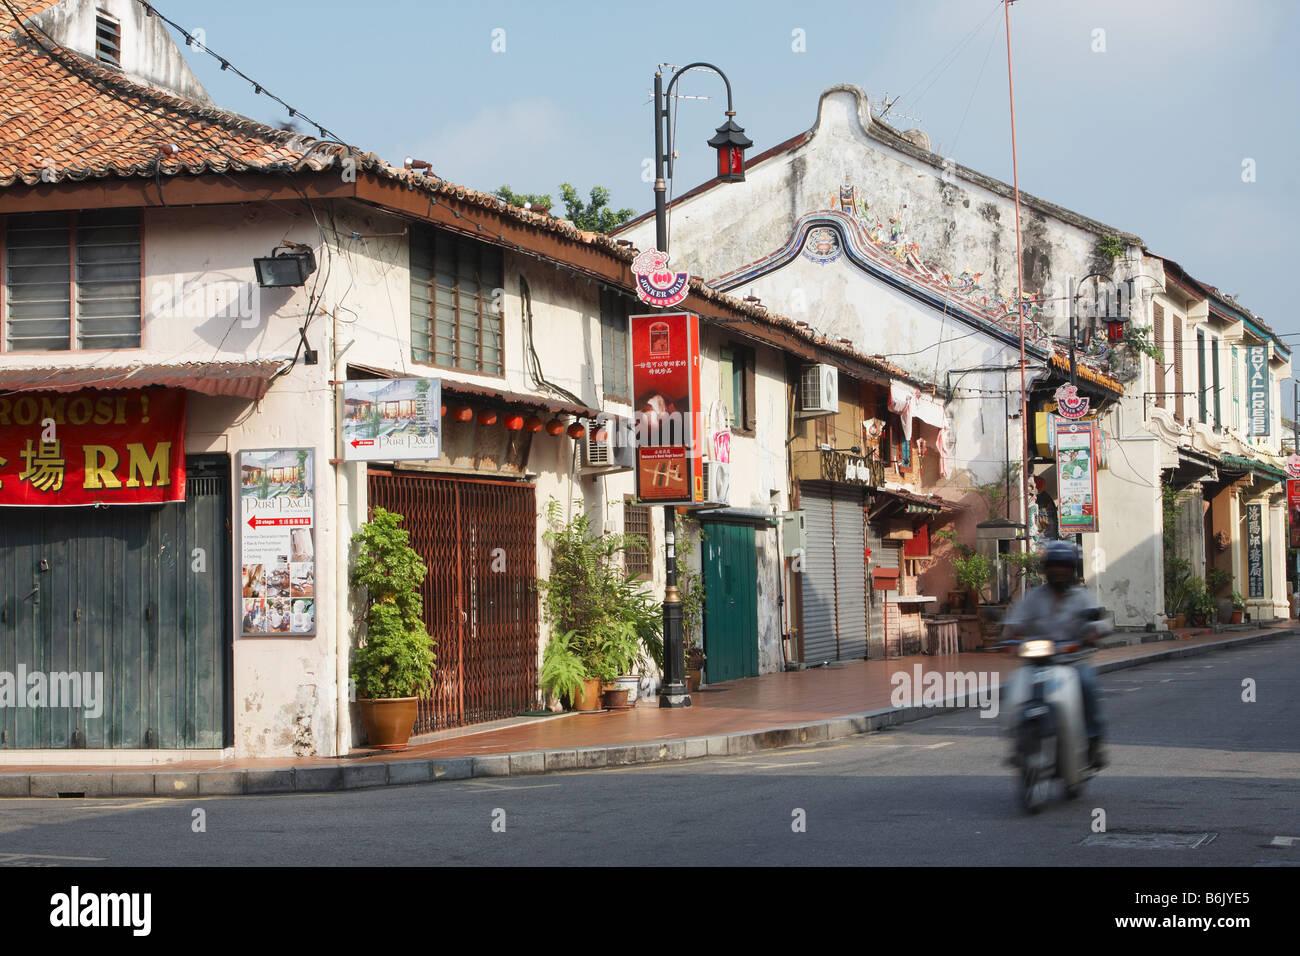 Motorcyclist Riding Along Street In Chinatown, Melaka - Stock Image